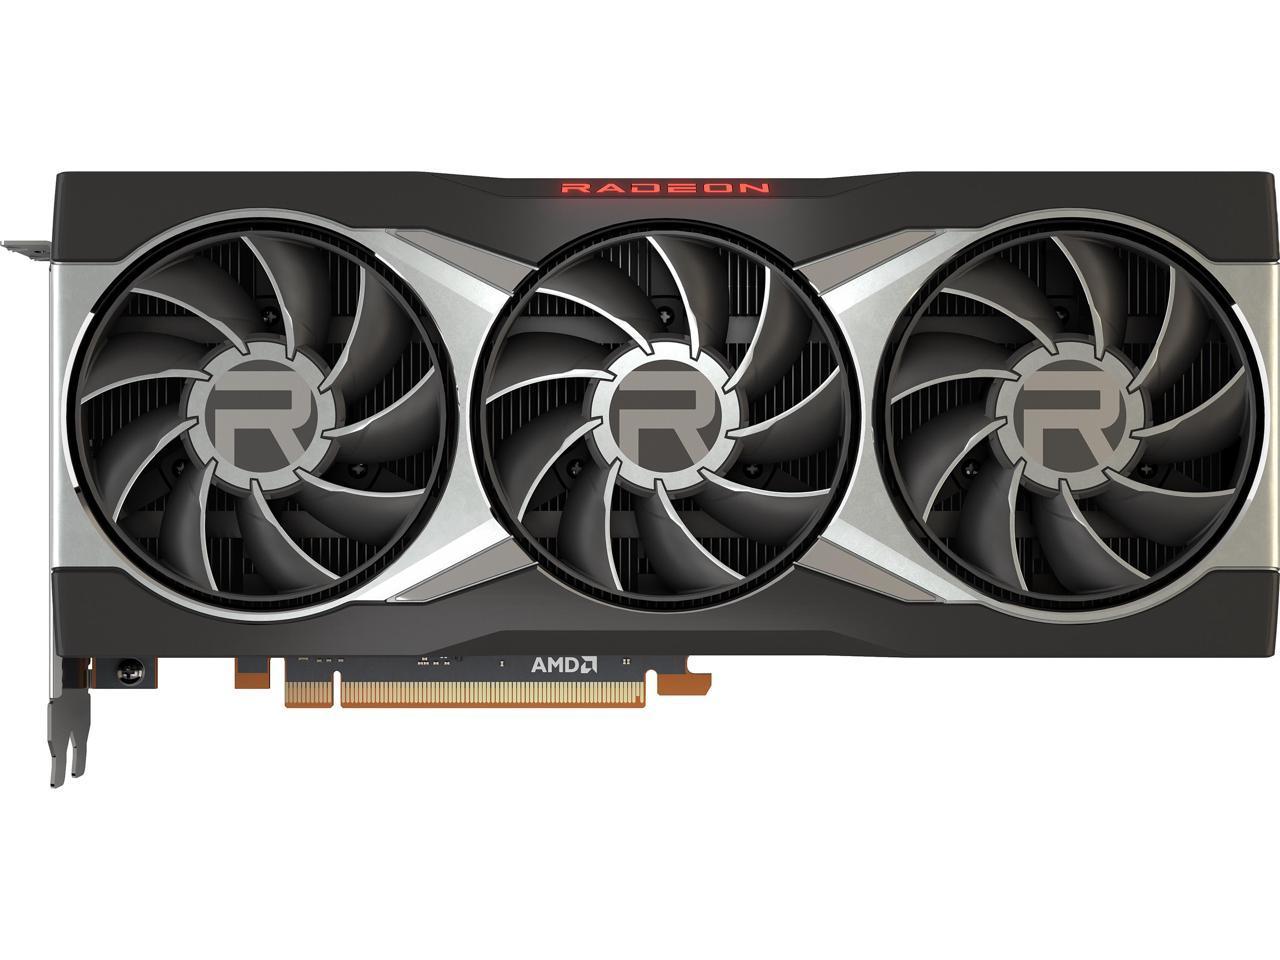 MSI Radeon RX 6800 DirectX 12 RX 6800 16G Graphics Card HDCP Ready 2X DisplayPort PCI Express 4.0 1x HDMI 2.1 w// Mytrix HDMI 2.1 Cable VR Ready 16GB 256-Bit GDDR6